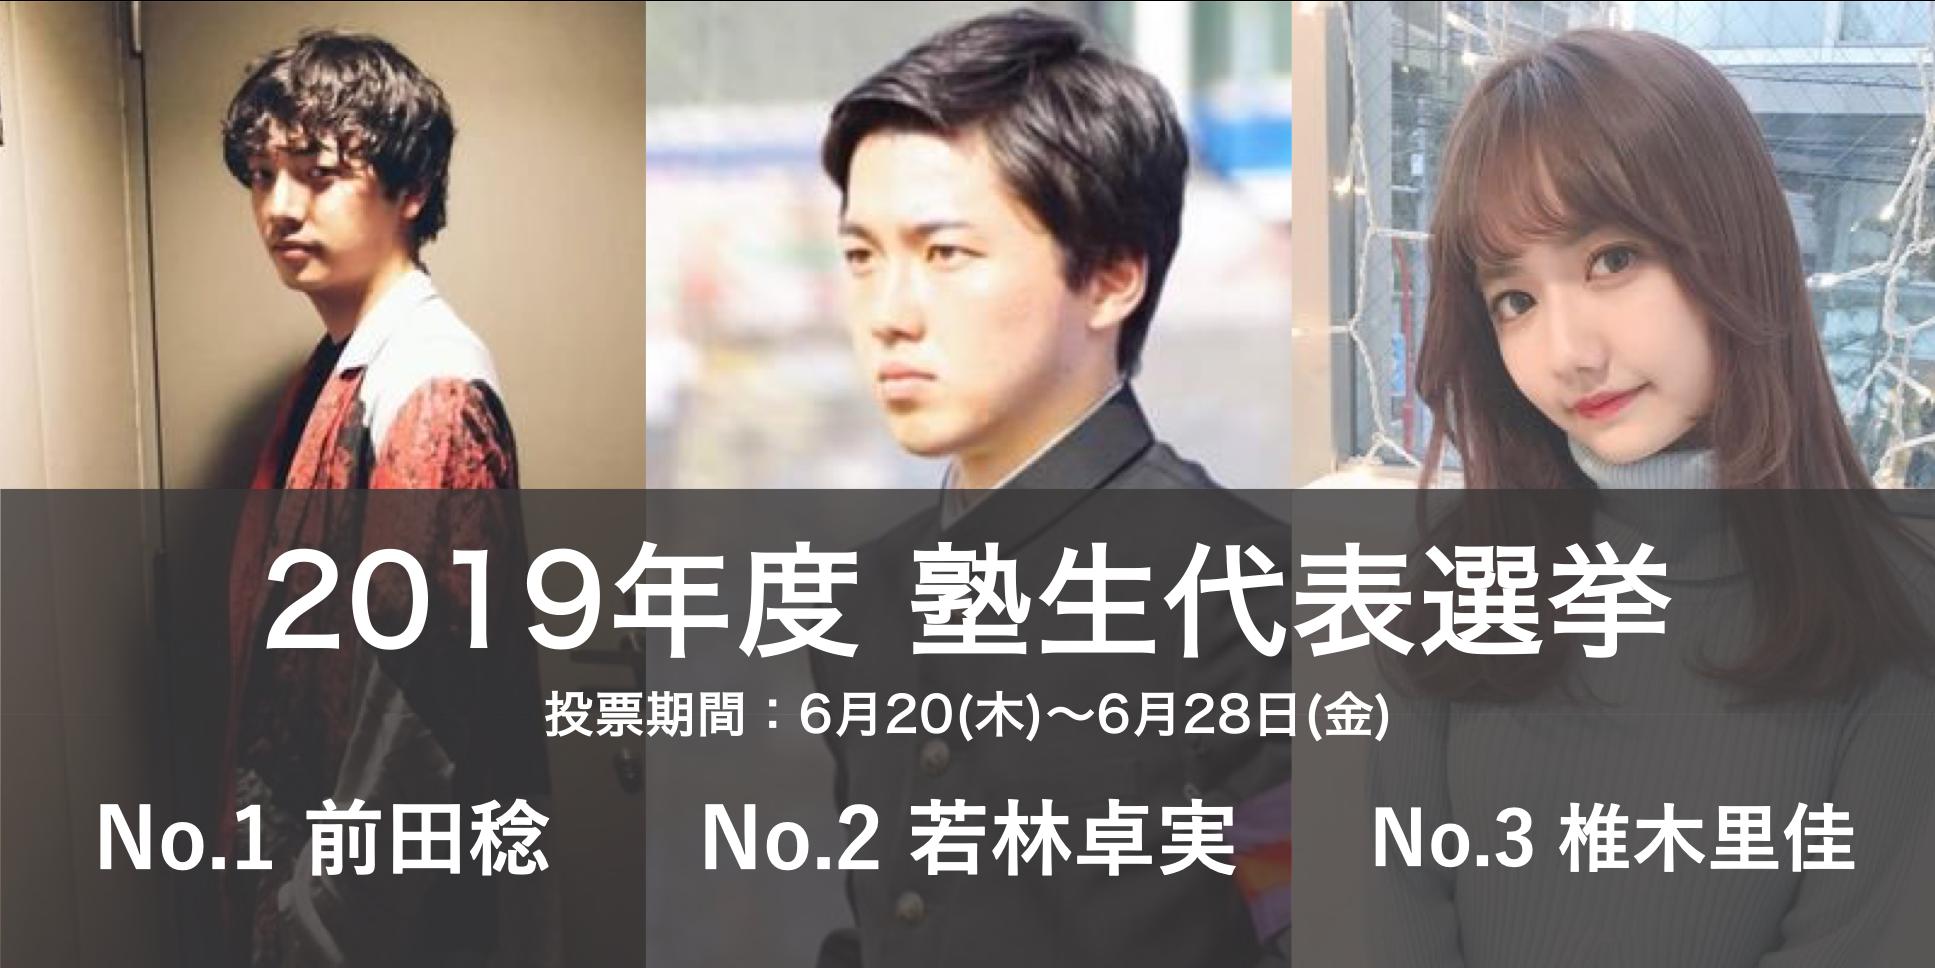 【2019年度】塾生代表選挙の候補者が決定!選挙期間は6/20(木)〜6/28(金)